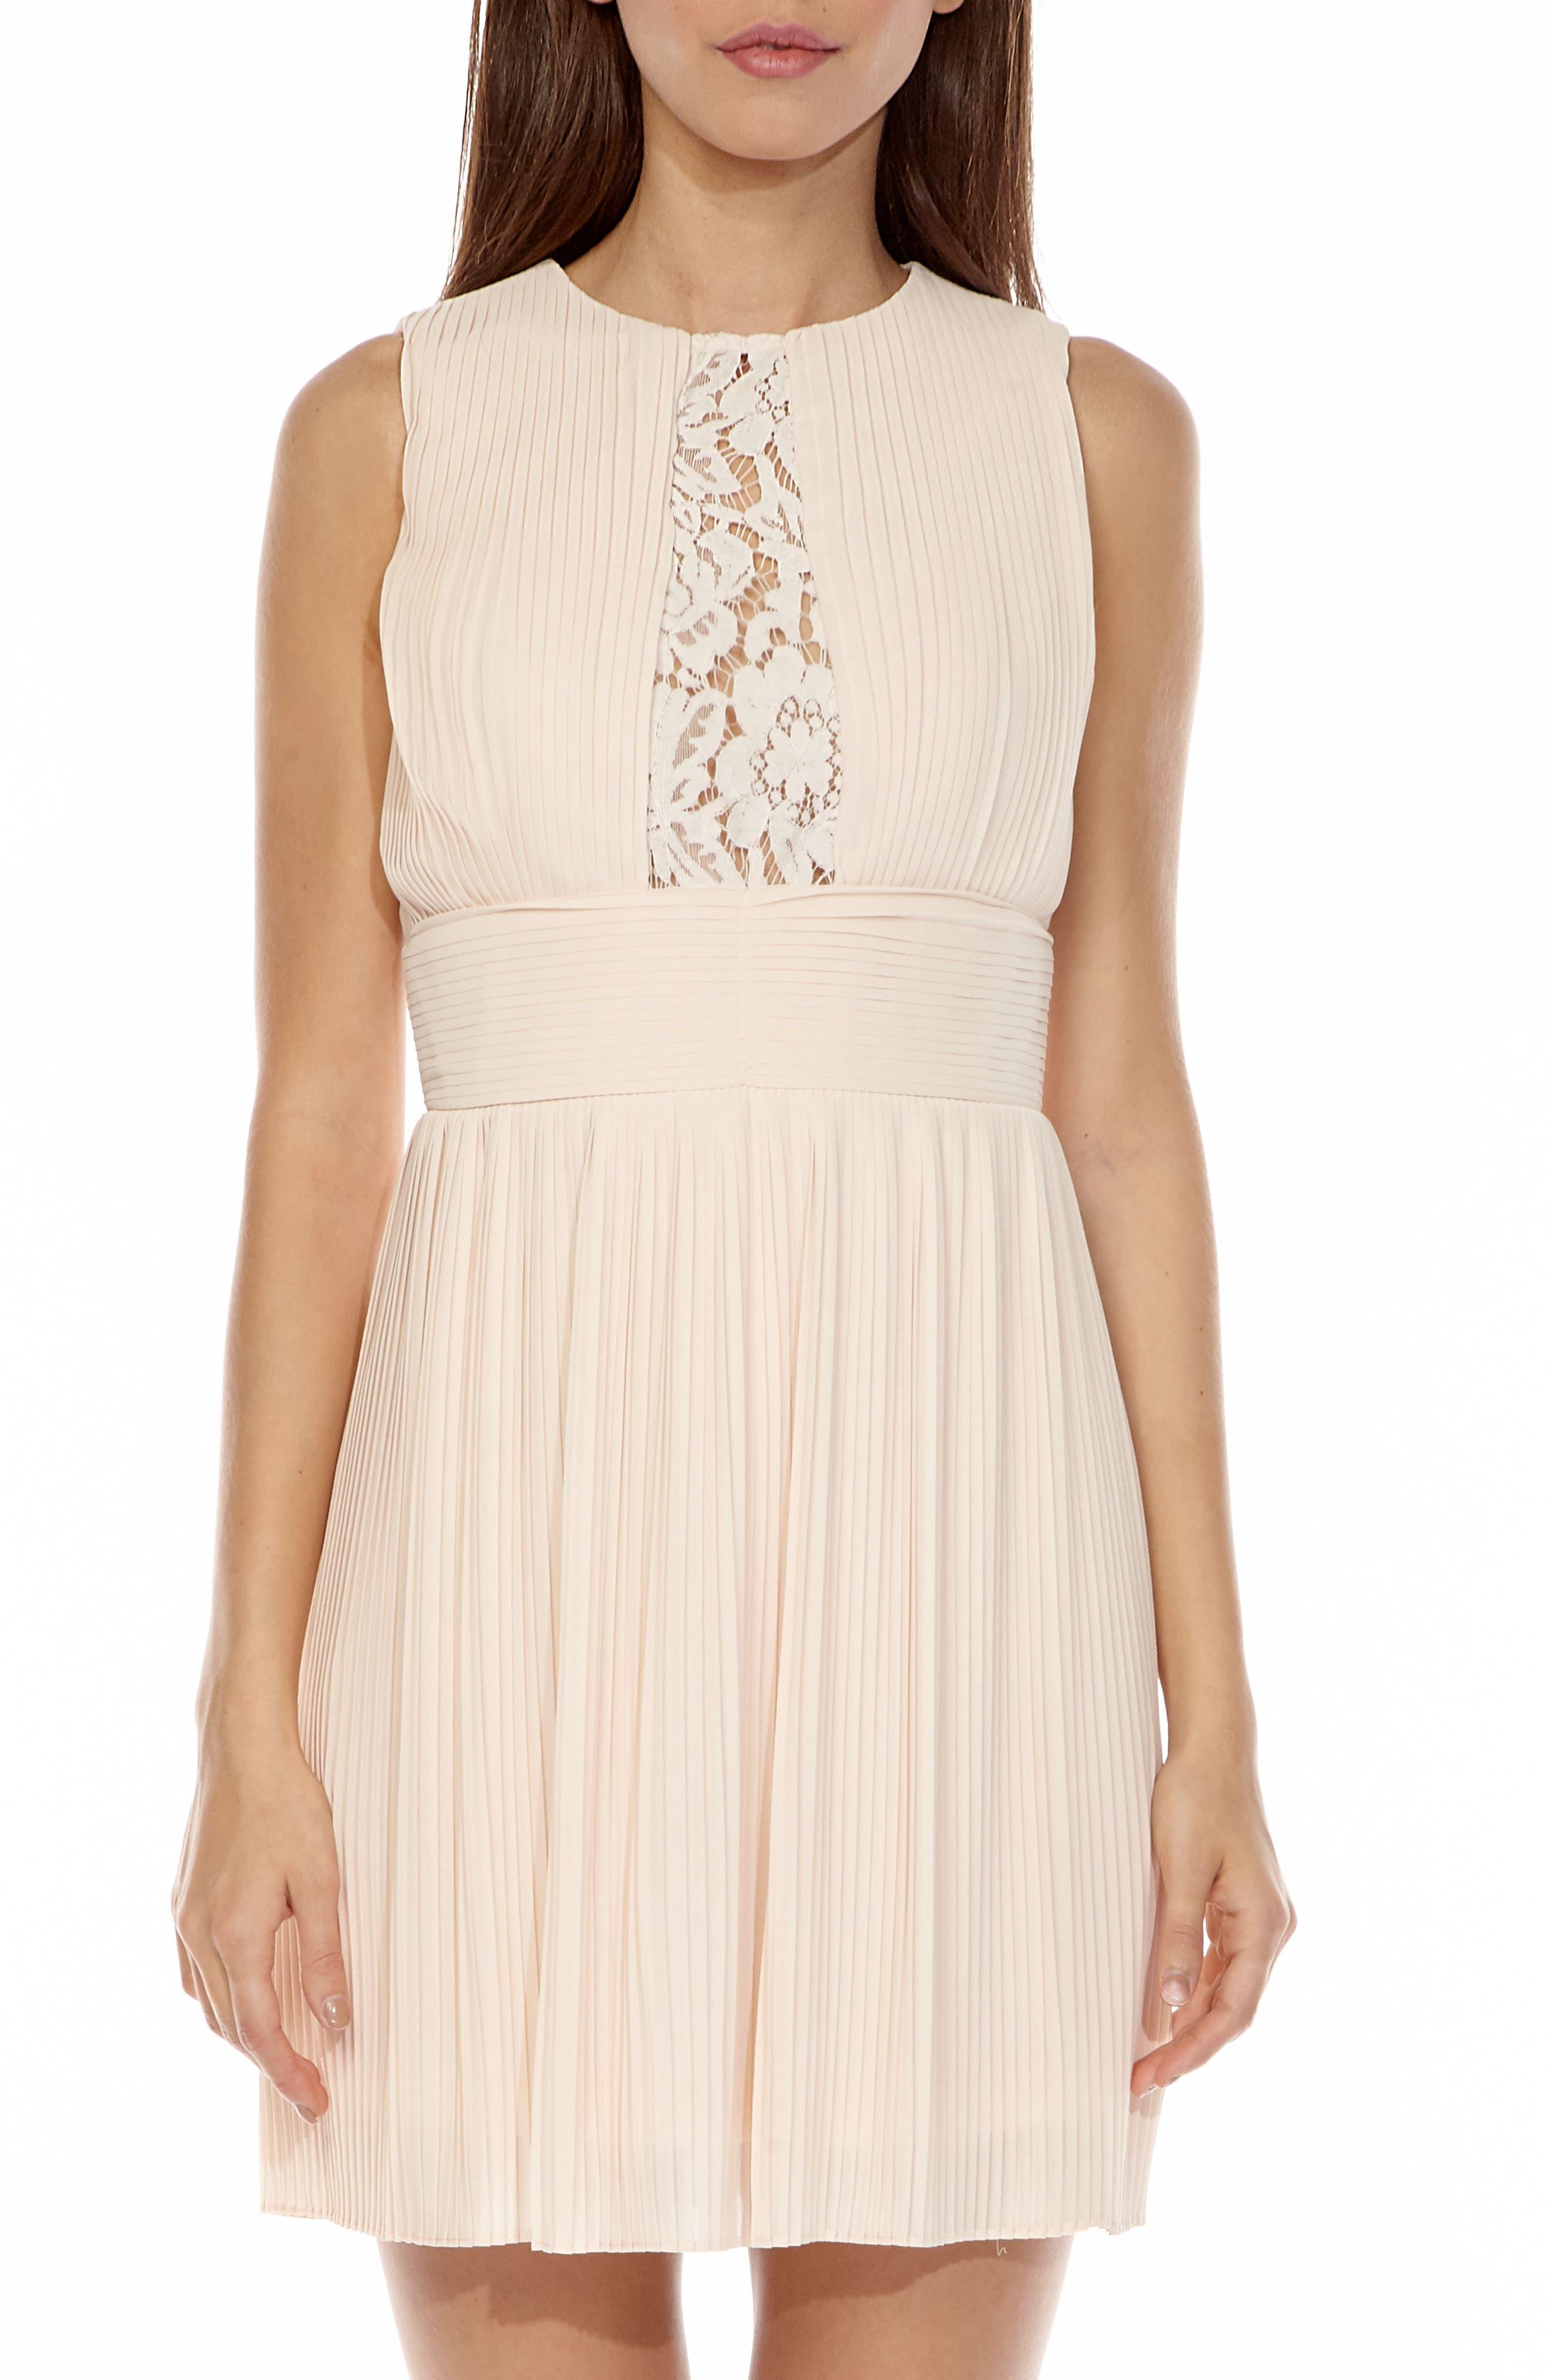 Alternate Image 1 Selected - TFNC Dori Pleat Chiffon Fit & Flare Dress